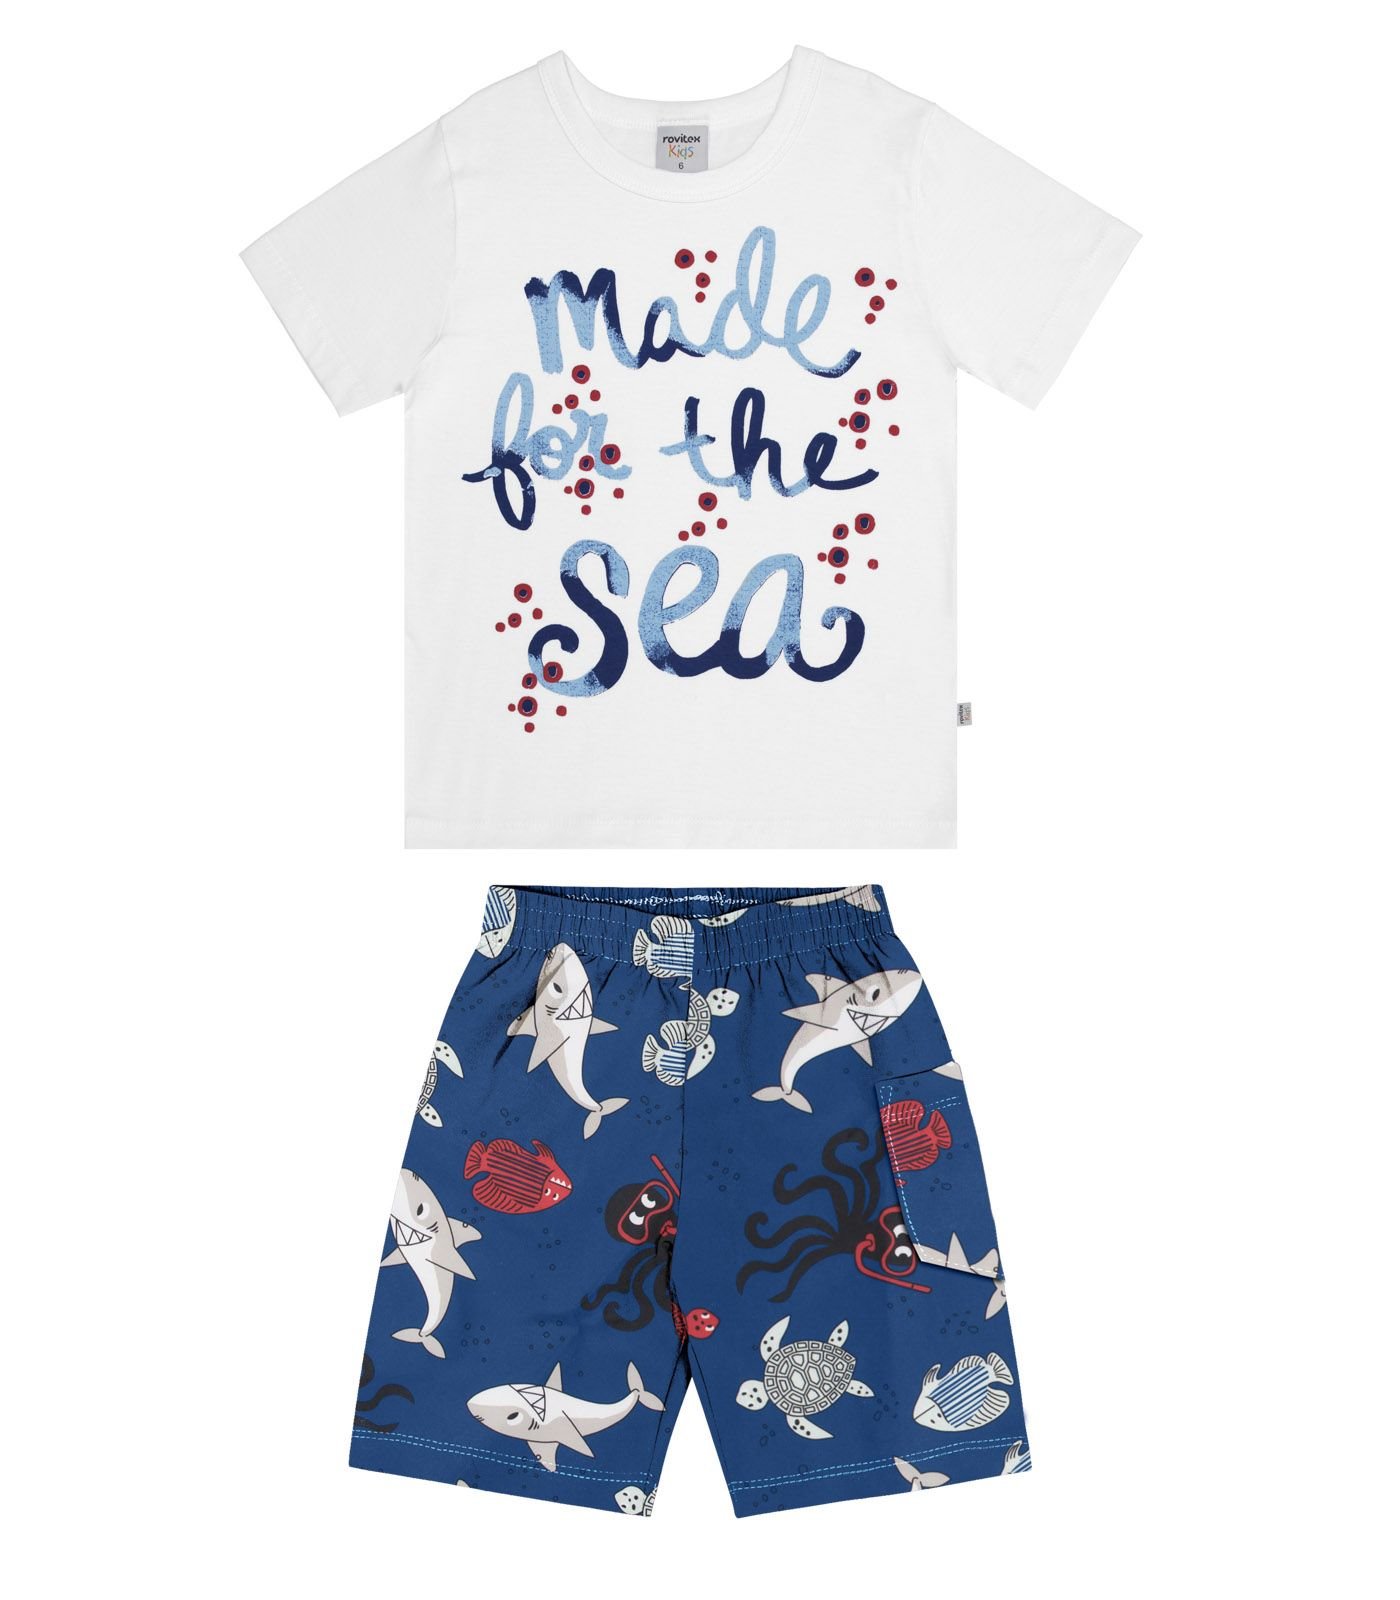 Conjunto Bermuda com Camiseta Microfibra / Meia Malha - Estampado